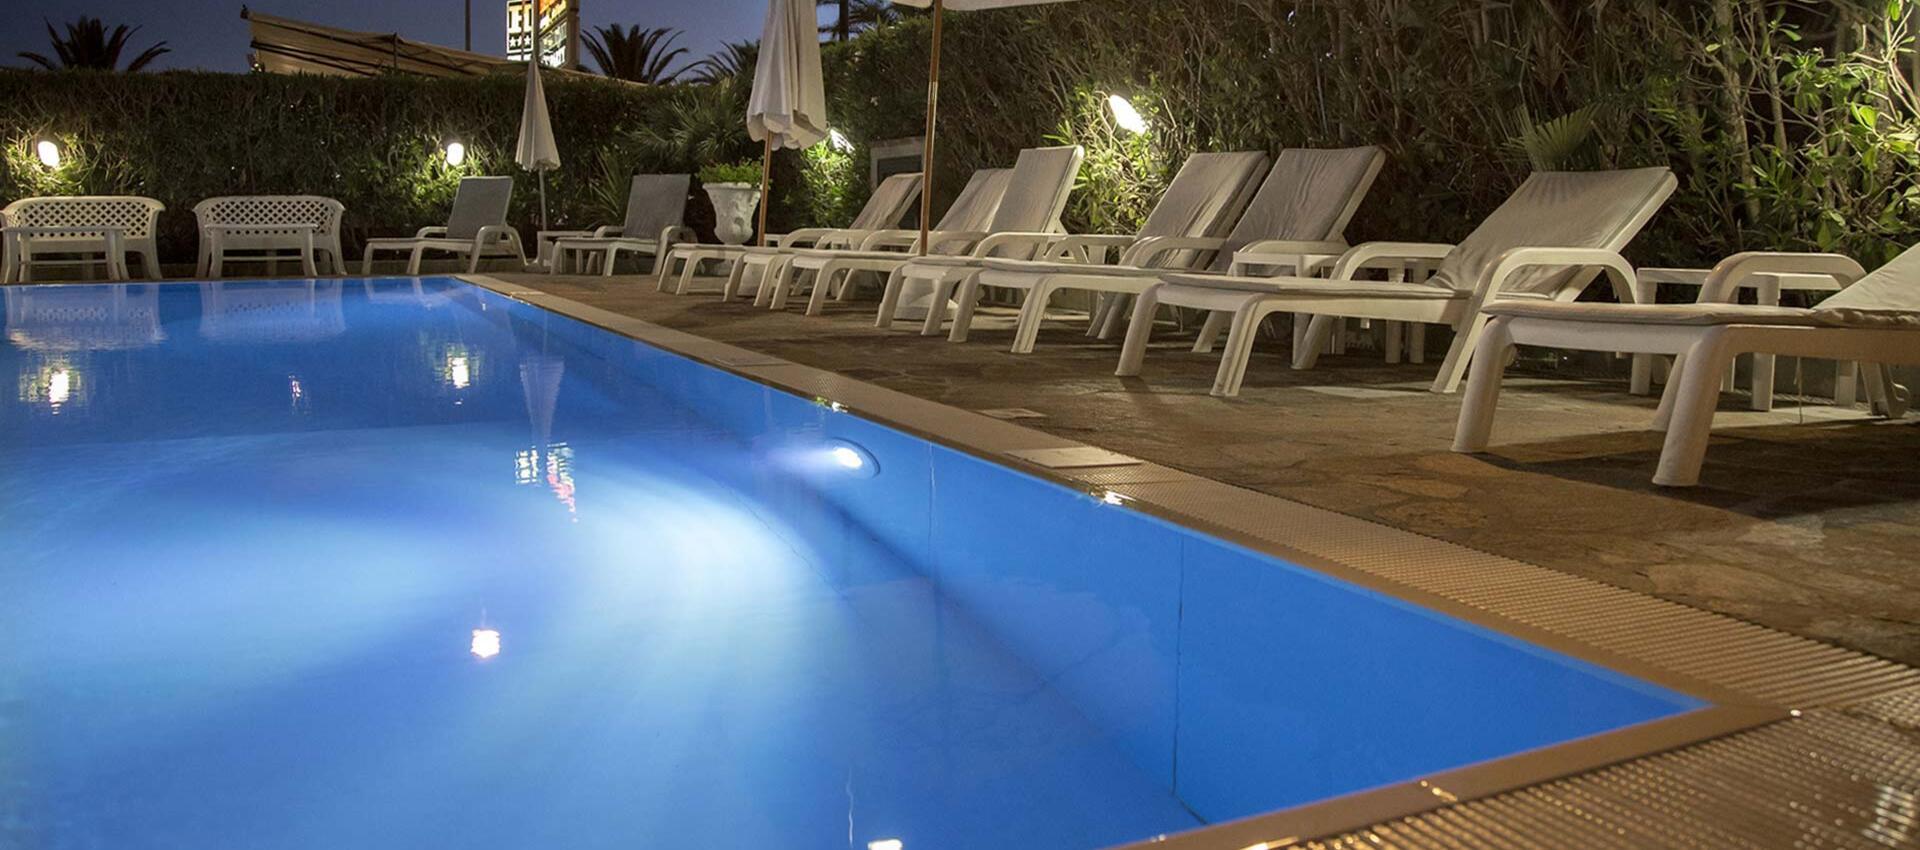 hotelbixio it home 011